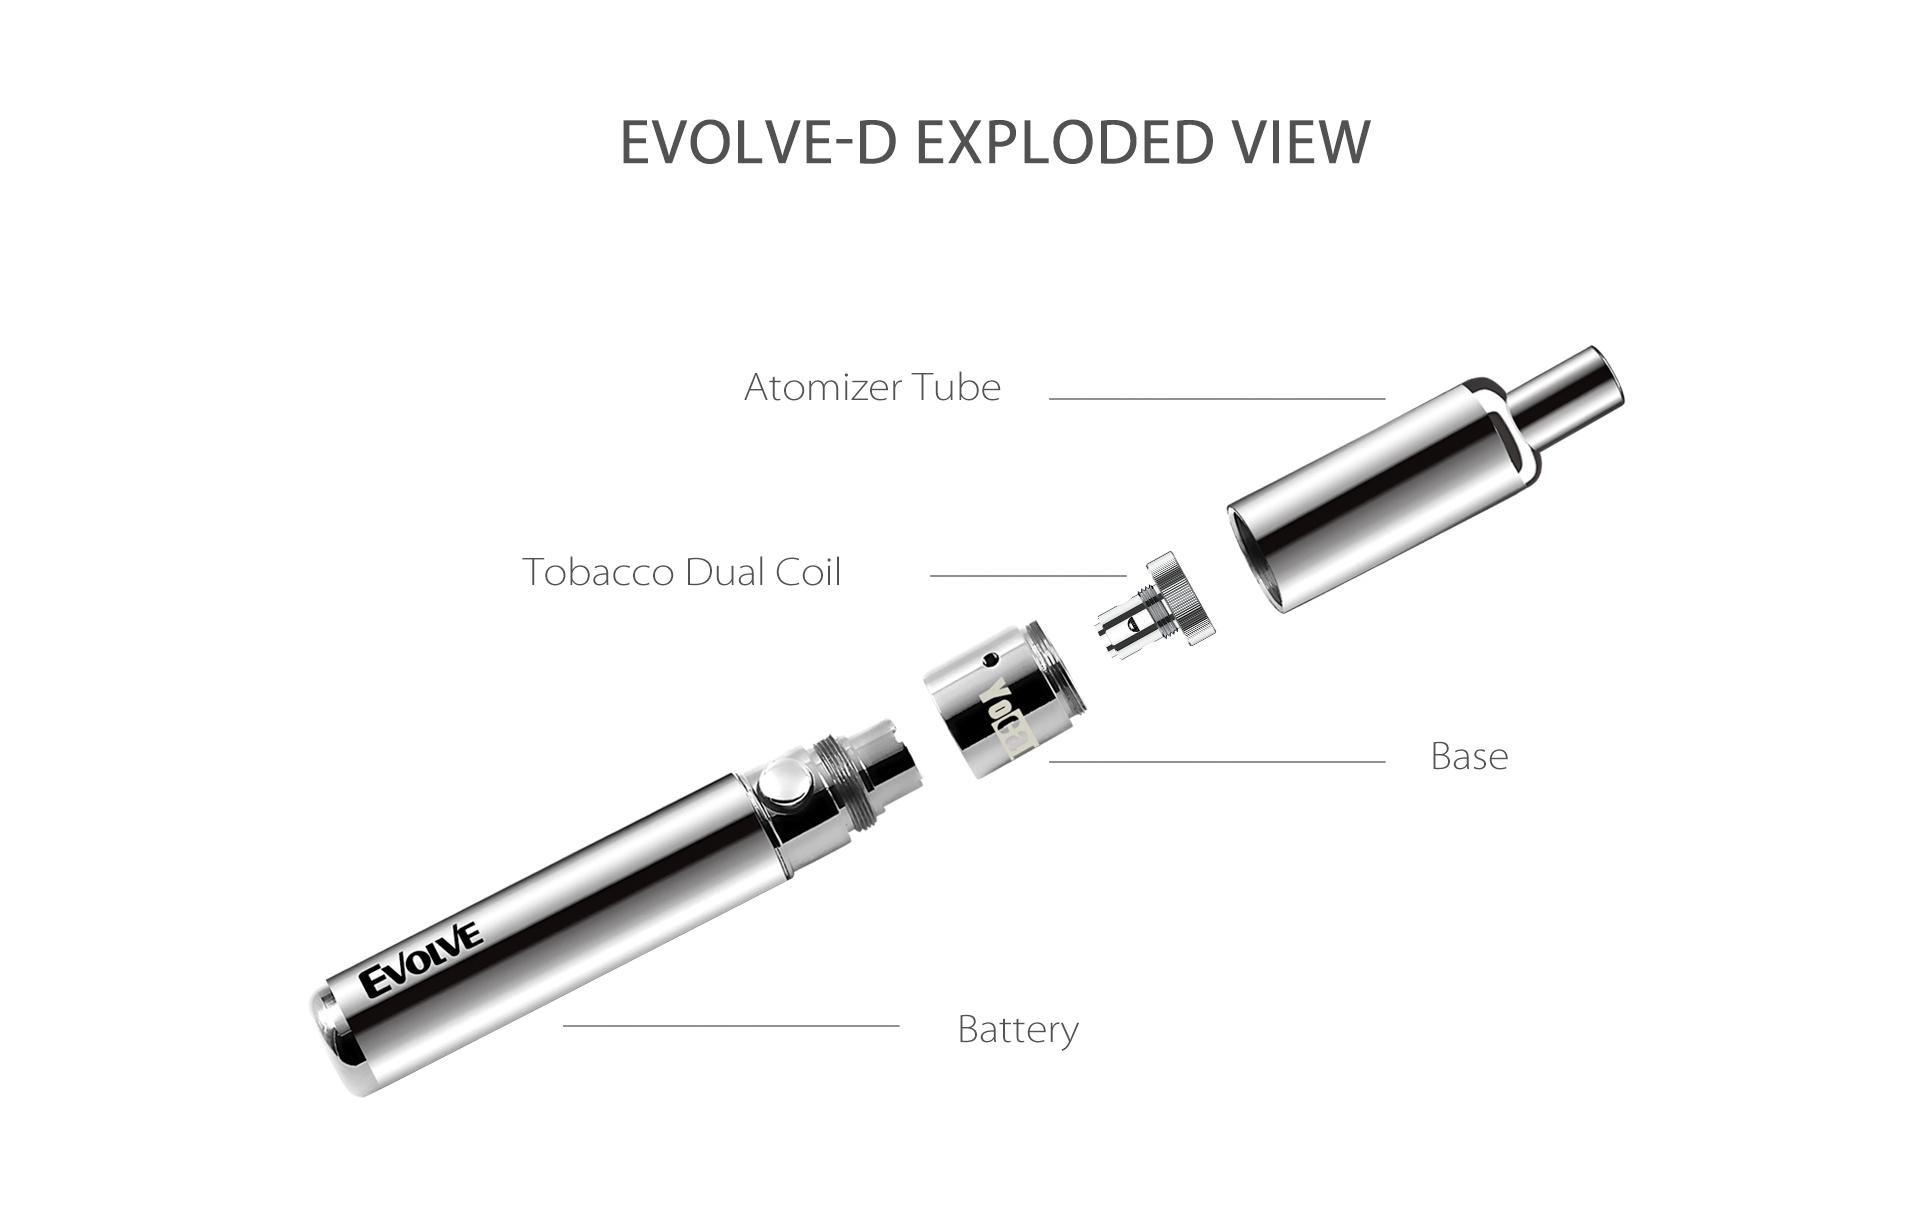 Yocan Evolve-D vaporizer pen 2020 version exploded view.